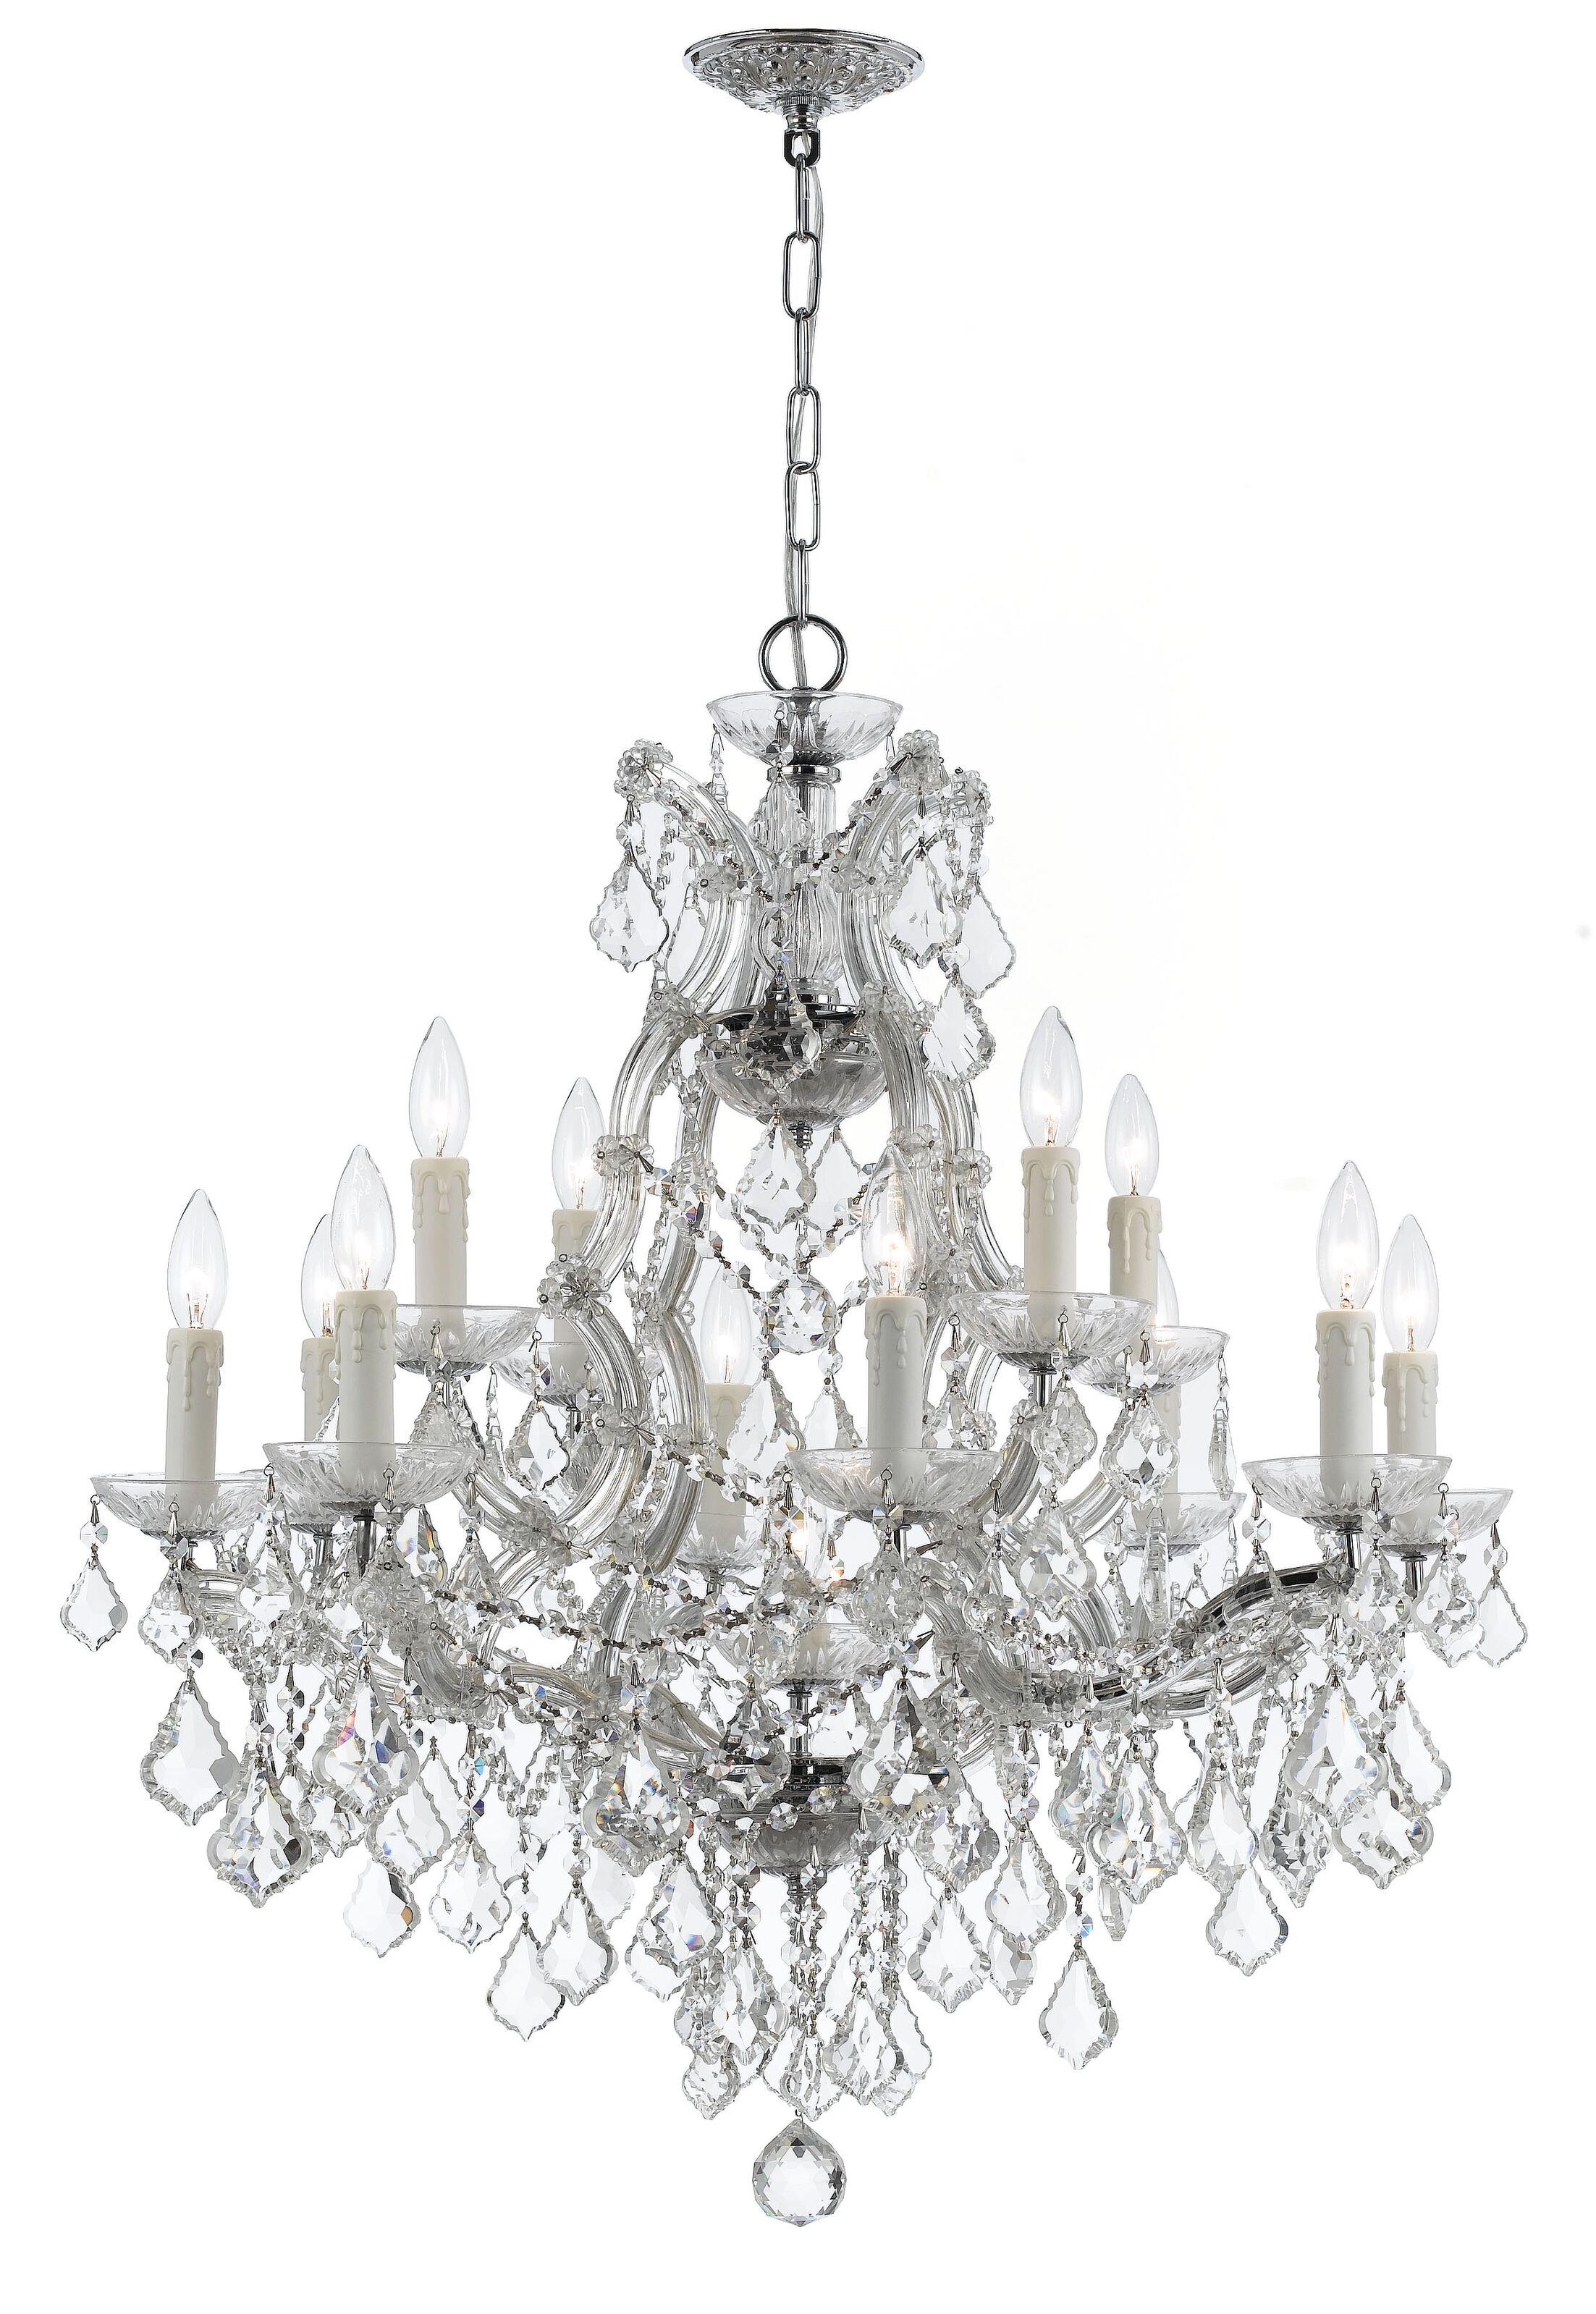 Griffiths 12-Light Candle Style Chandelier Finish: Polished Chrome, Crystal Type: Swarovski Elements